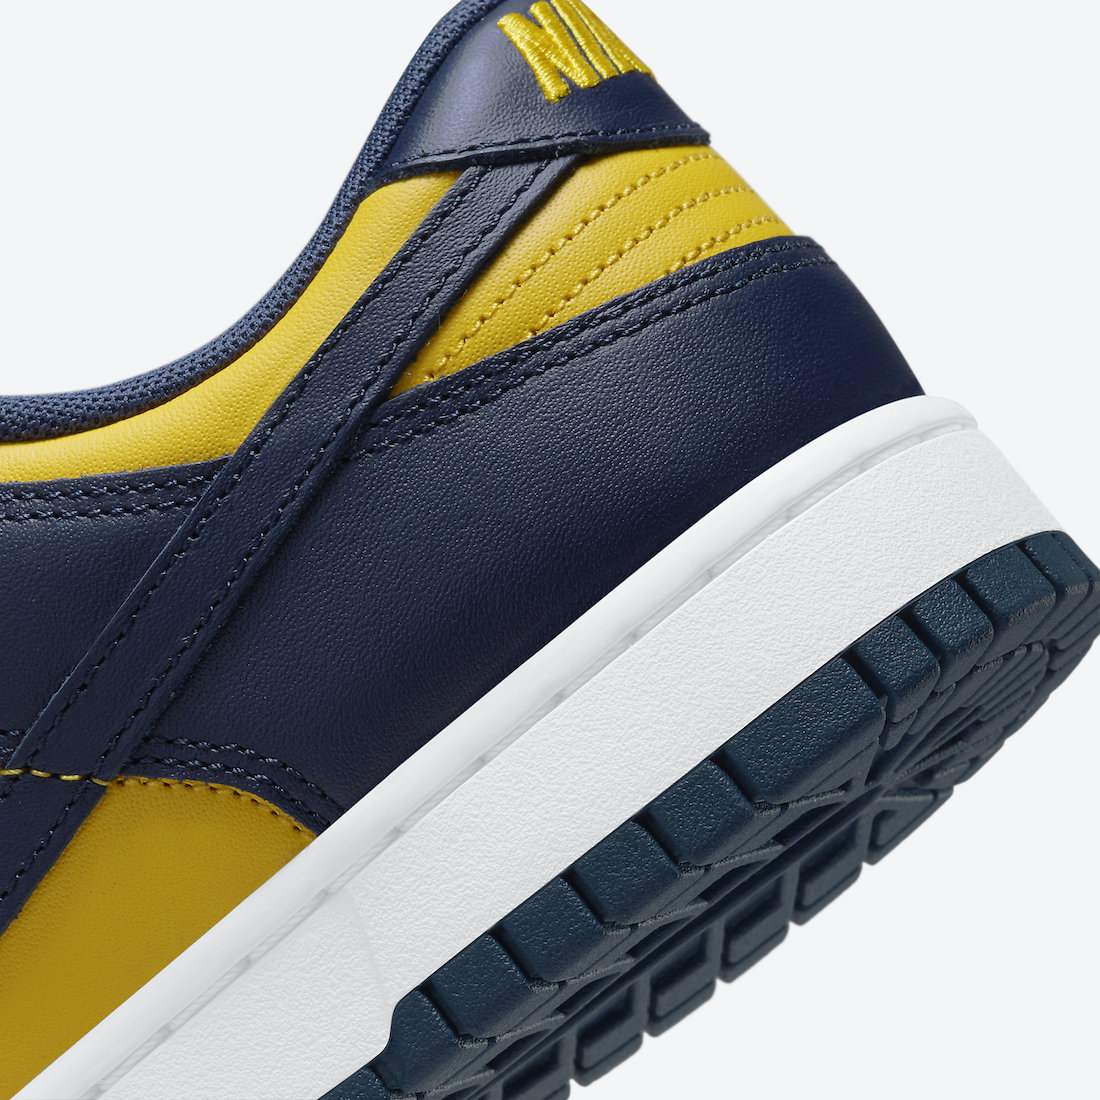 Nike-Dunk-Low-Michigan-DD1391-700-Release-Date-Price-7